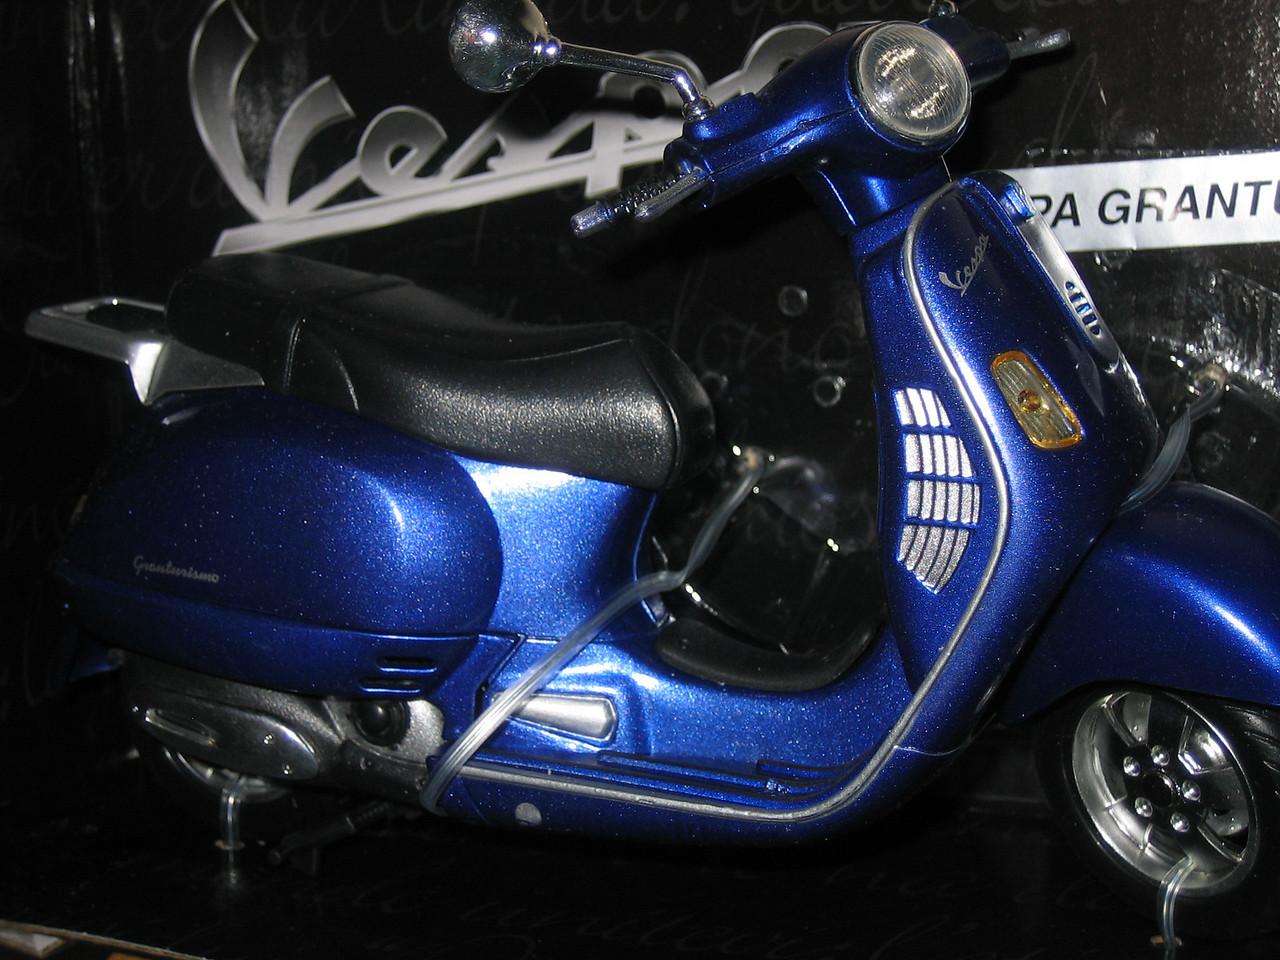 A mini-Vespa was found at the local auto parts shop in the Japantown mall. Grandtourismo!